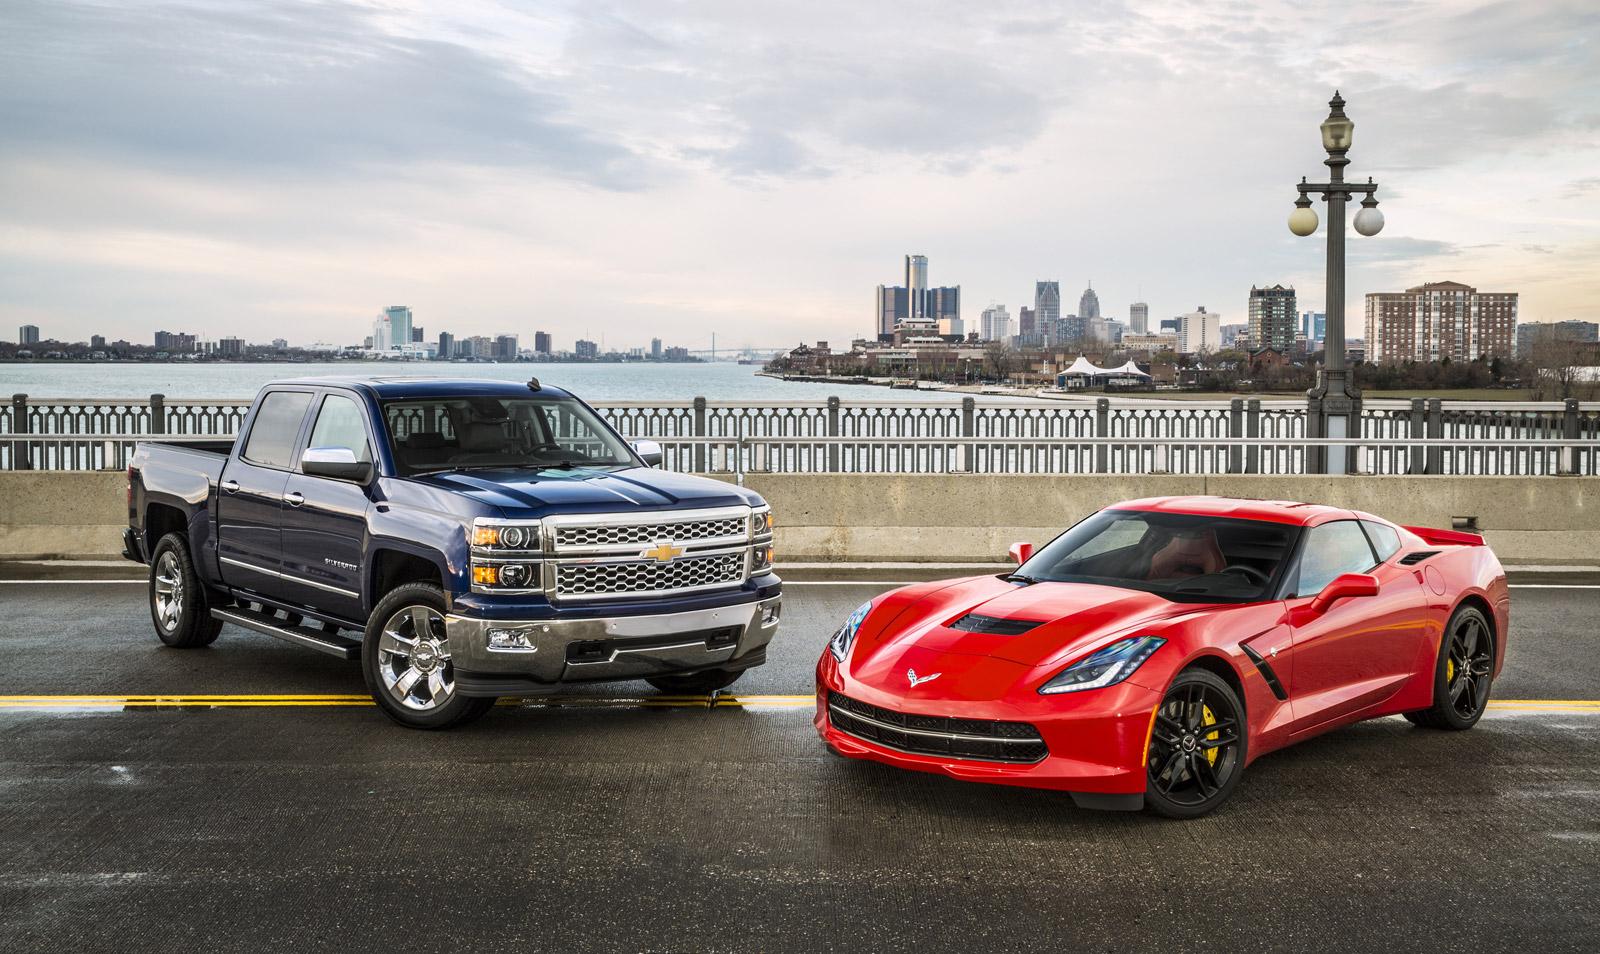 Chevy Corvette Stingray And Silverado Named North American